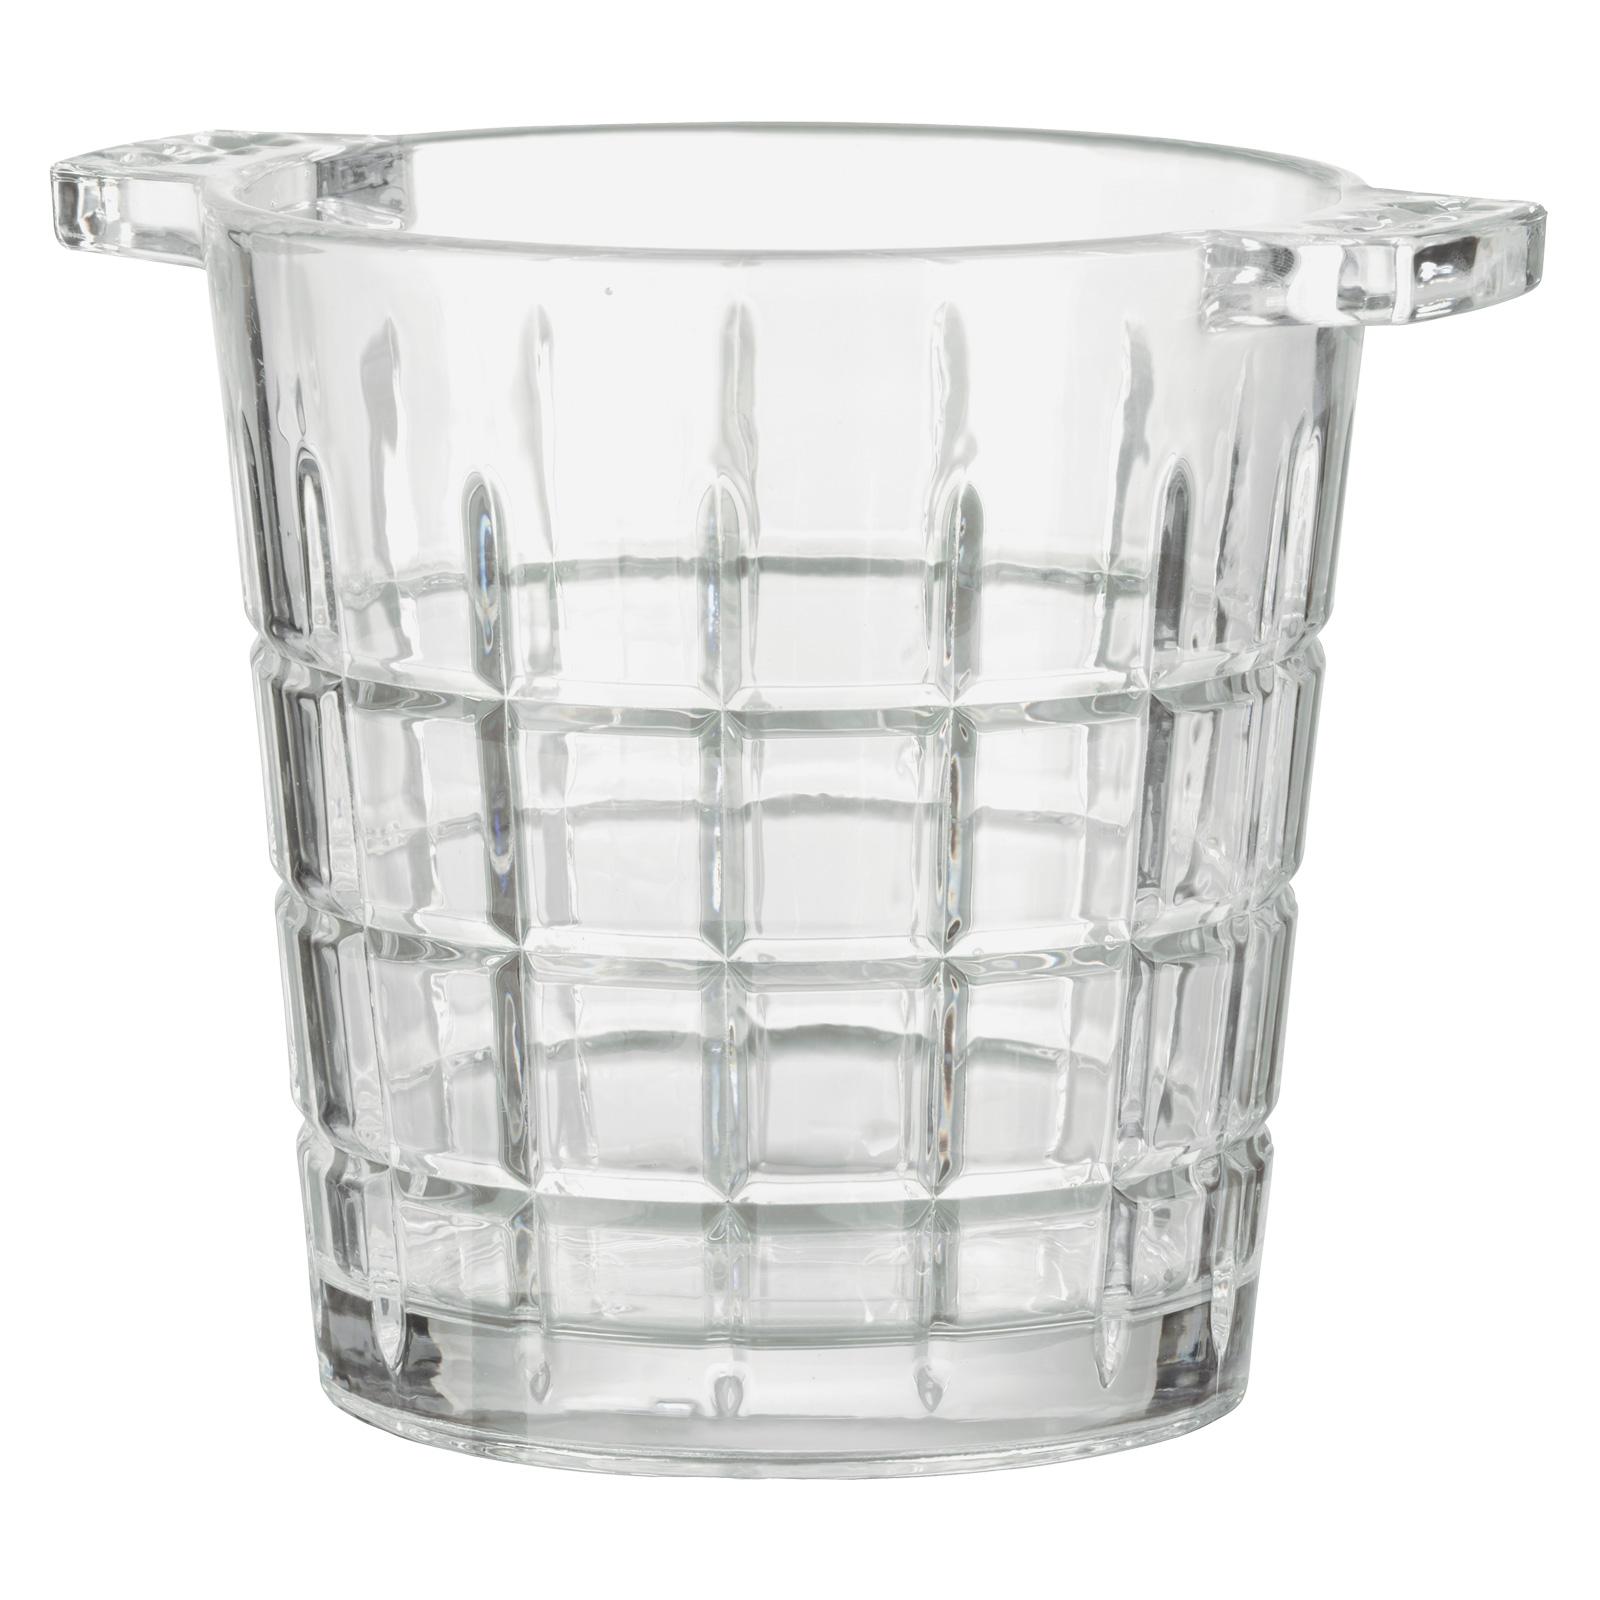 Newport Ice Bucket with Tongs by Artland